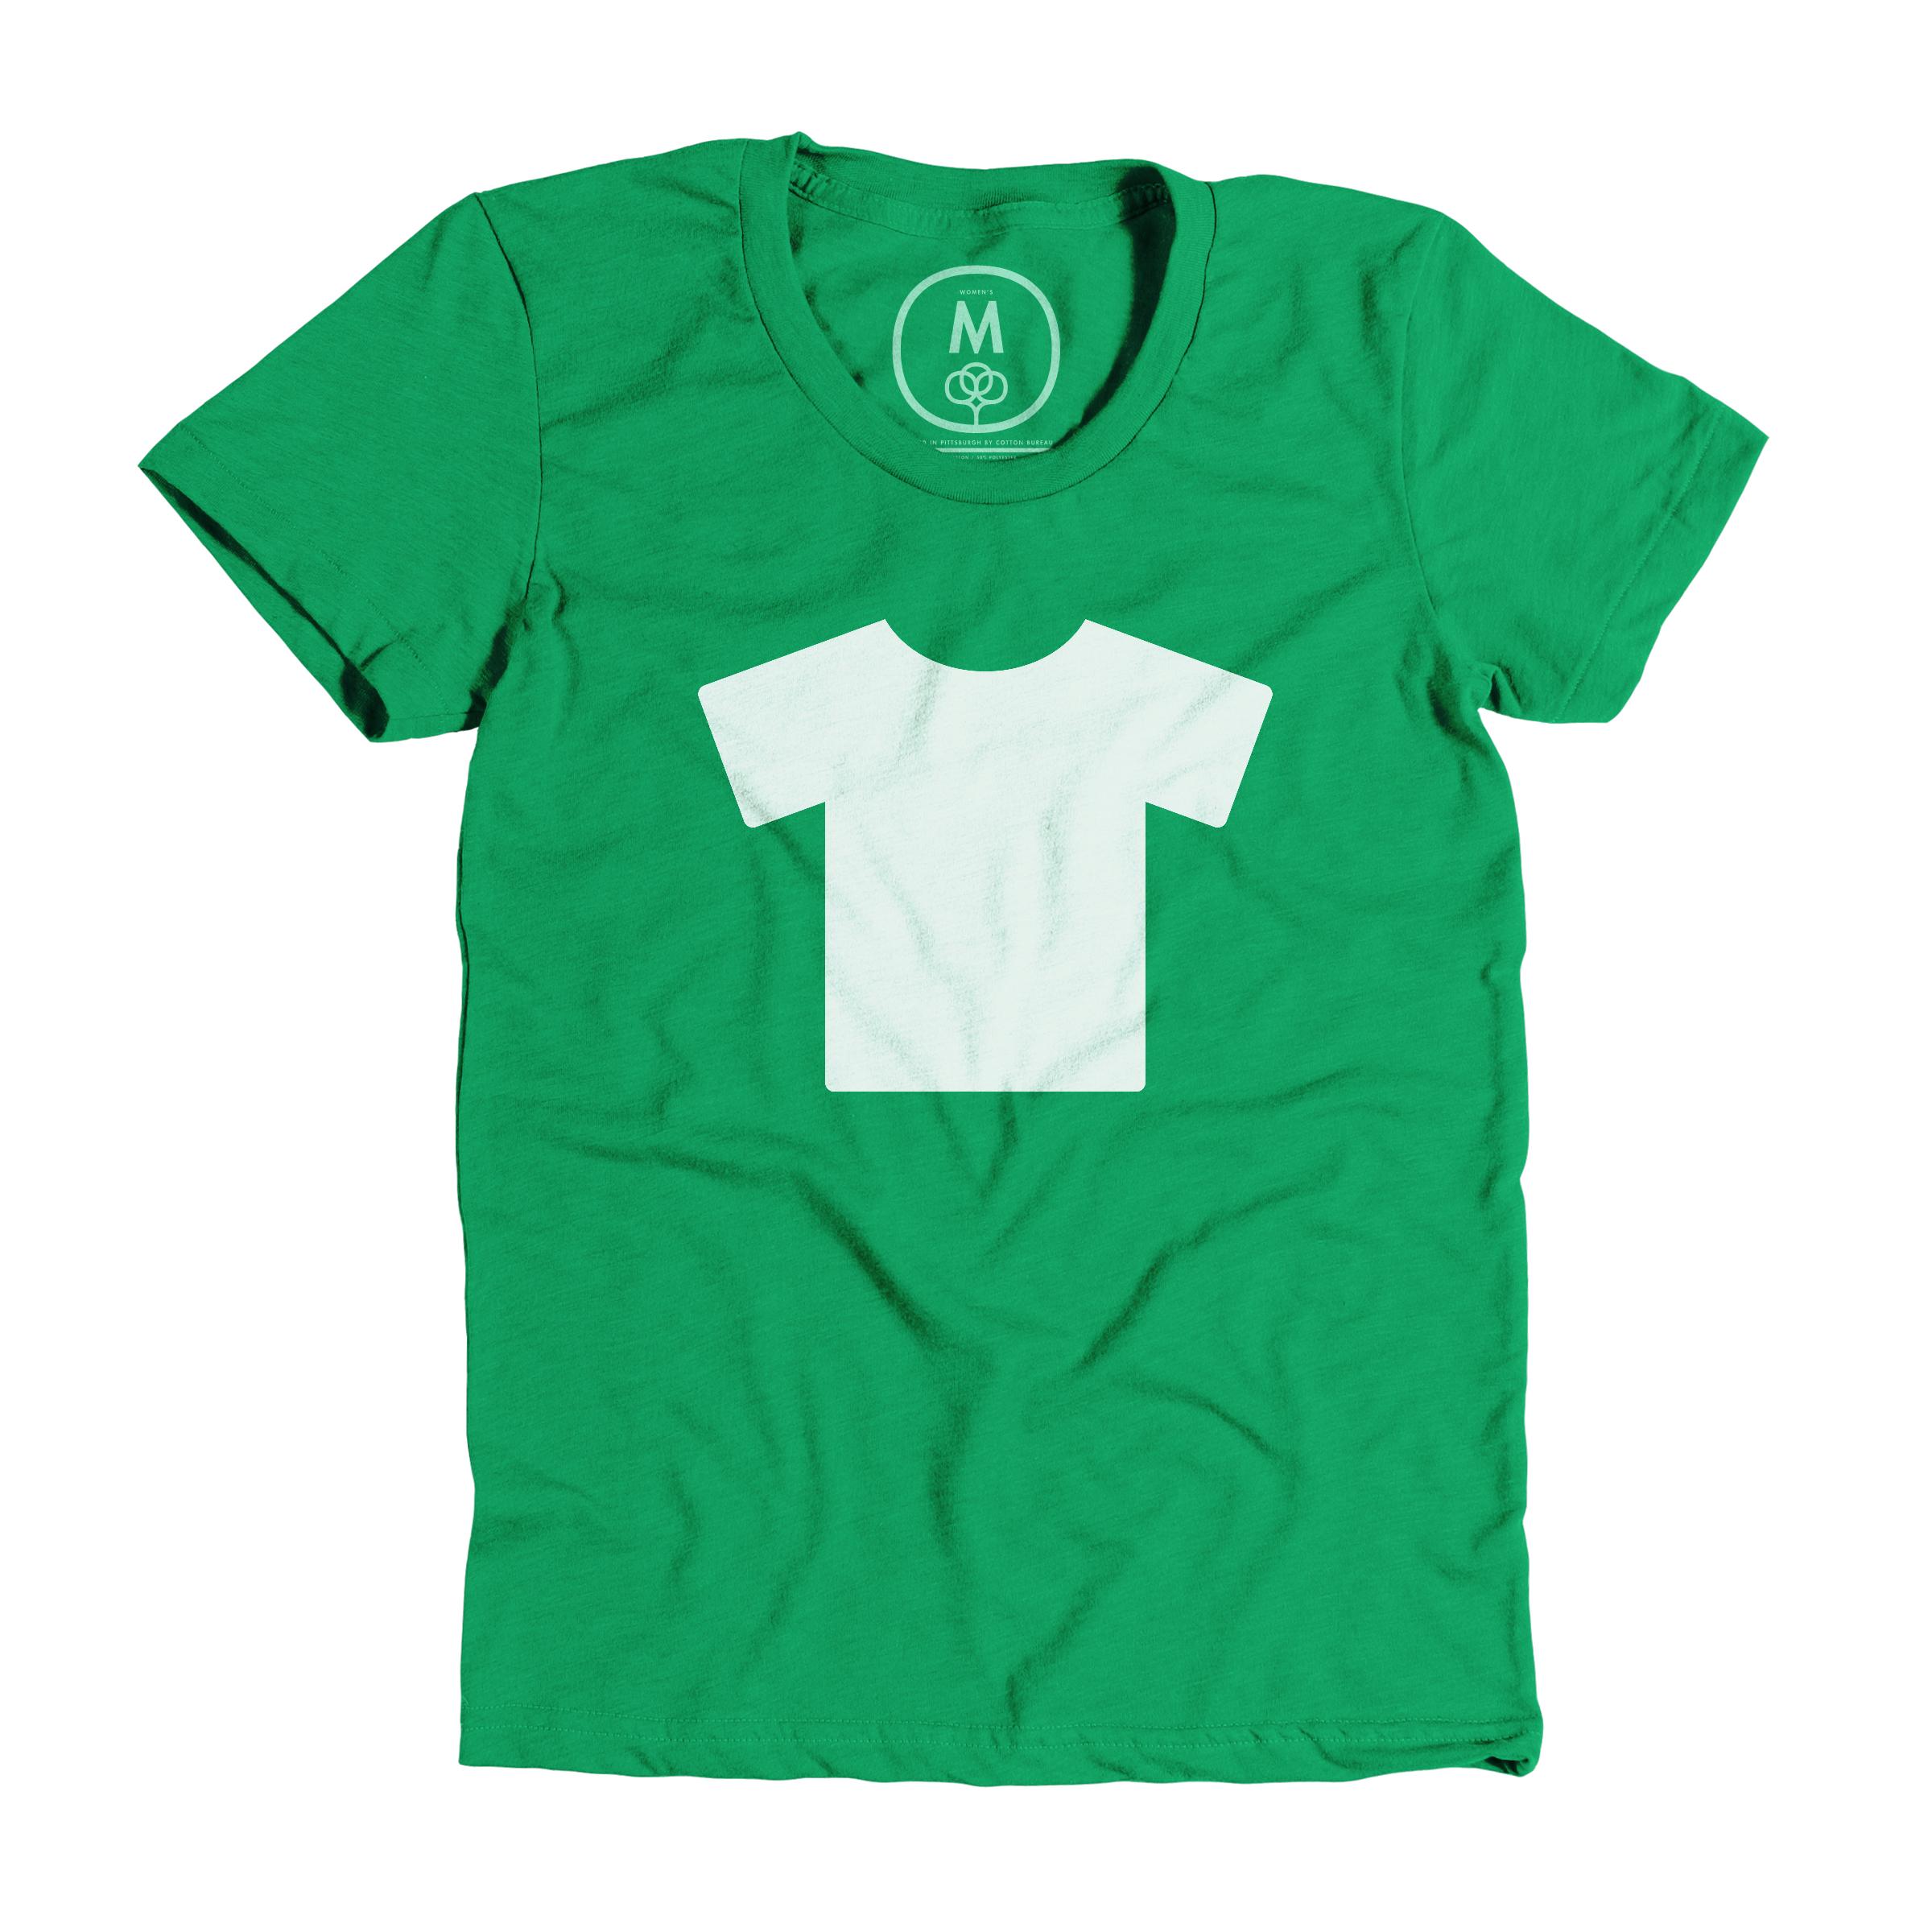 T-Shirt Kelly Green (Women's)